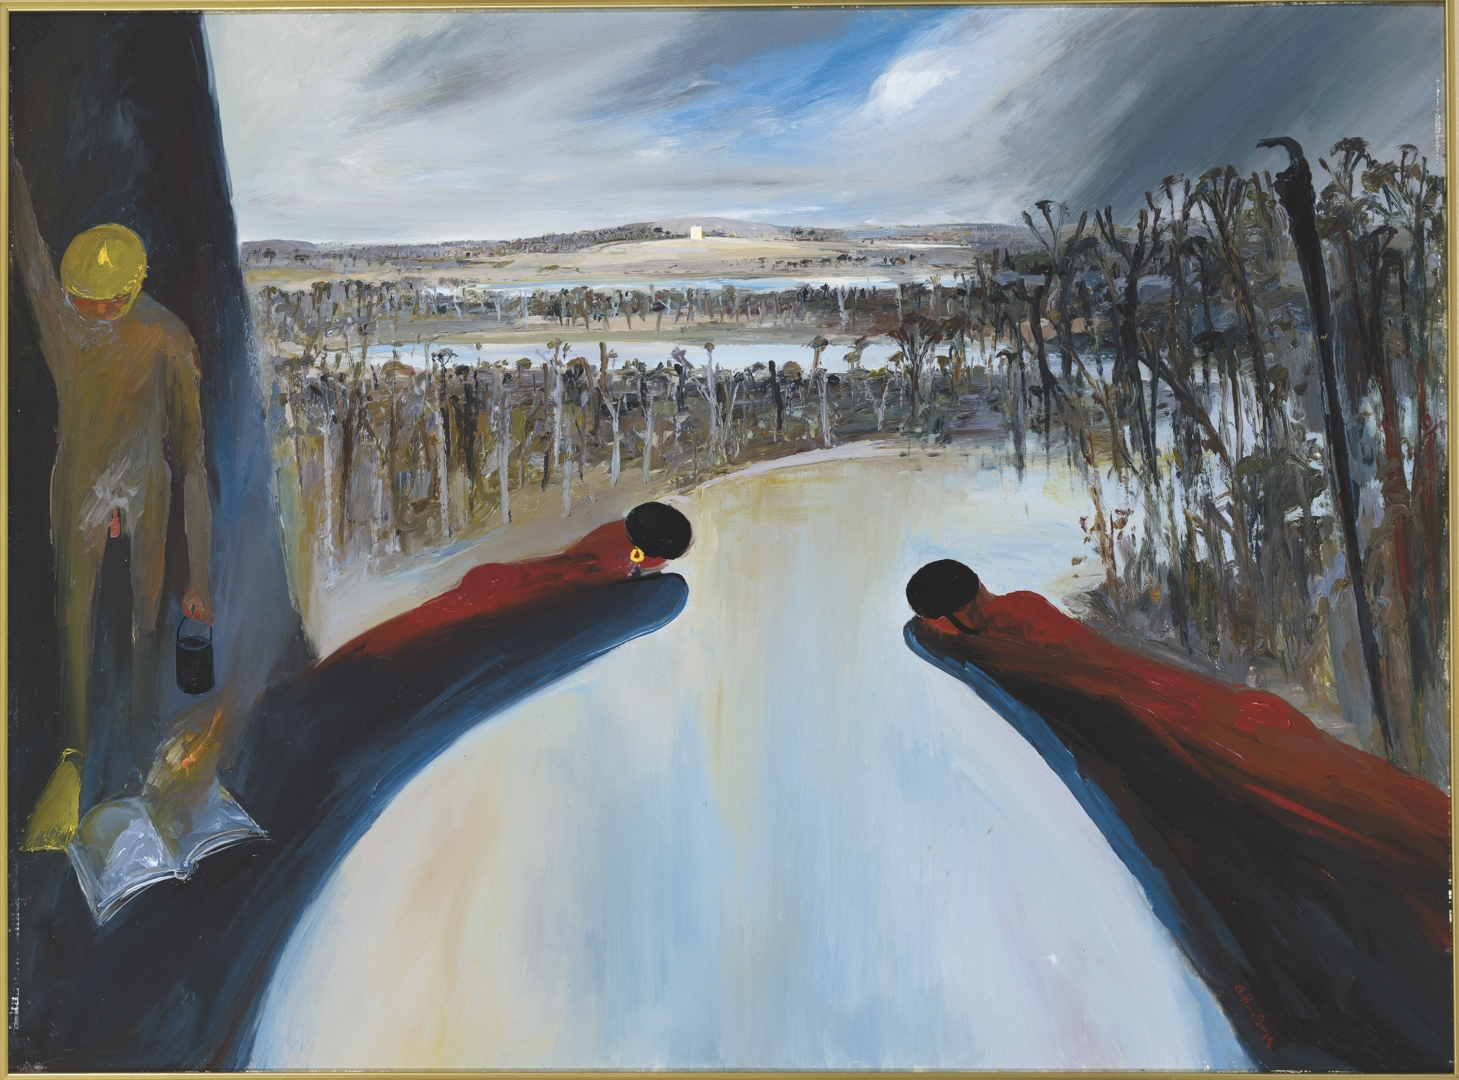 Arthur Boyd, Hanging rocks bathers and Mars, 1985, oil on canvas. Bundanon Trust Collection image